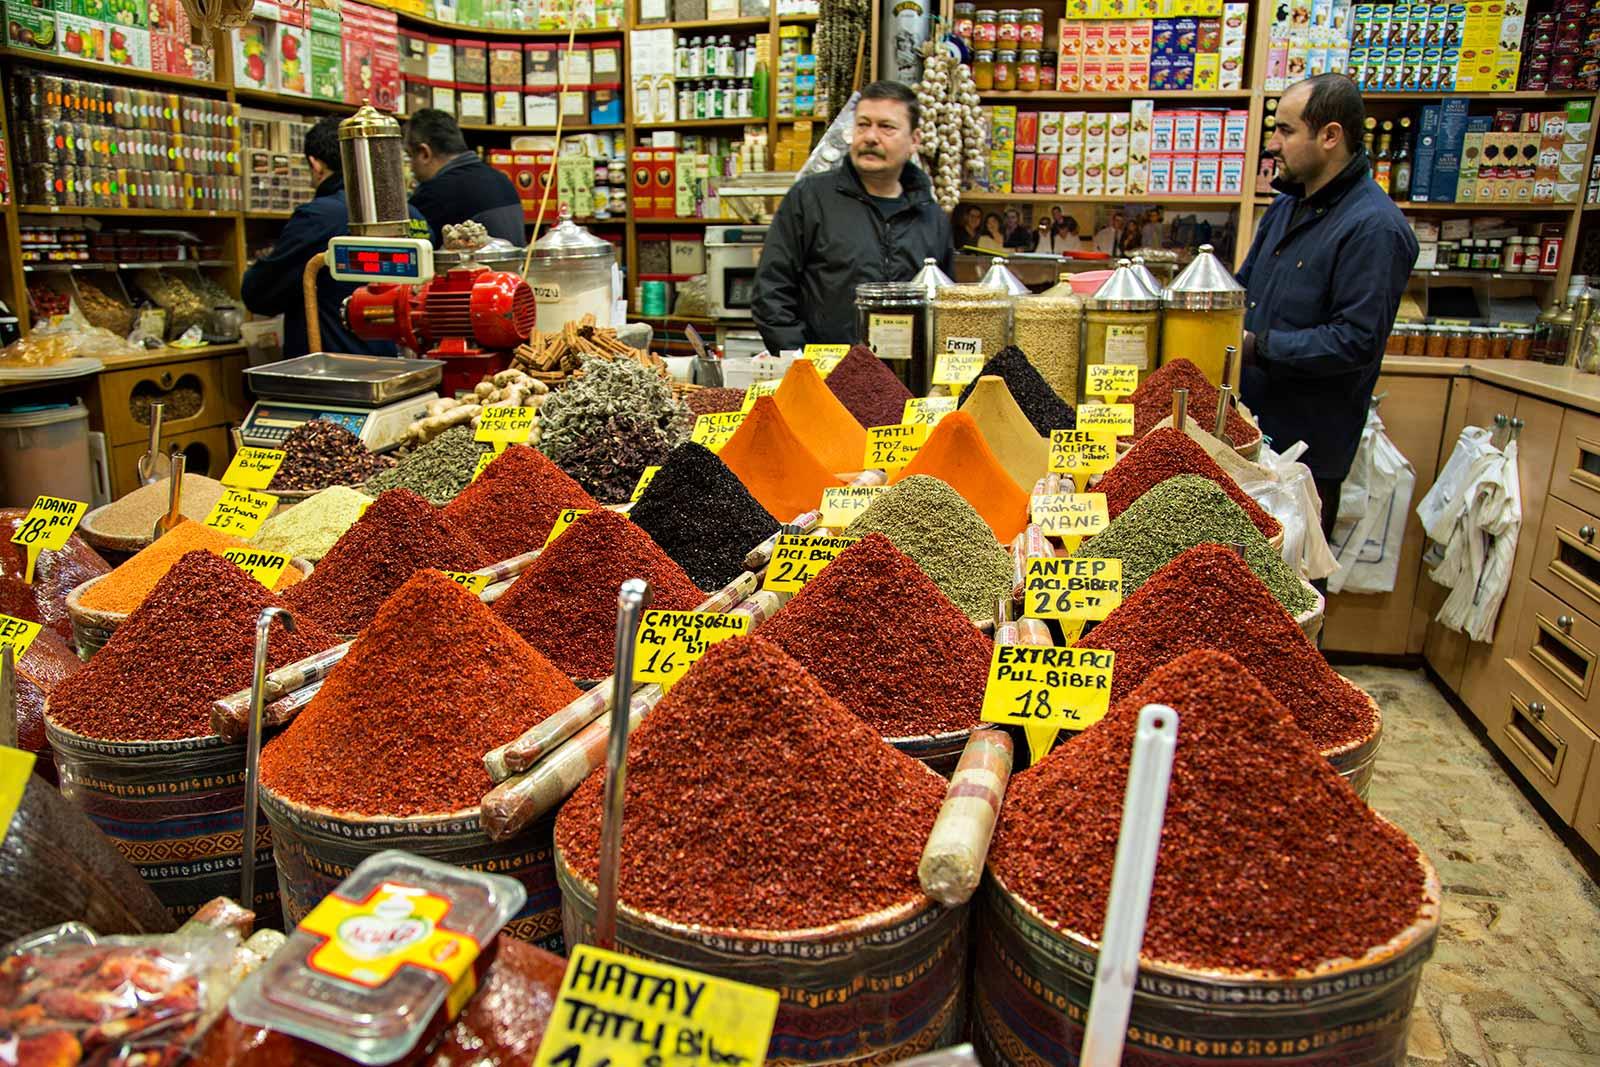 spice-bazaar-new-mosque-istanbul-turkey